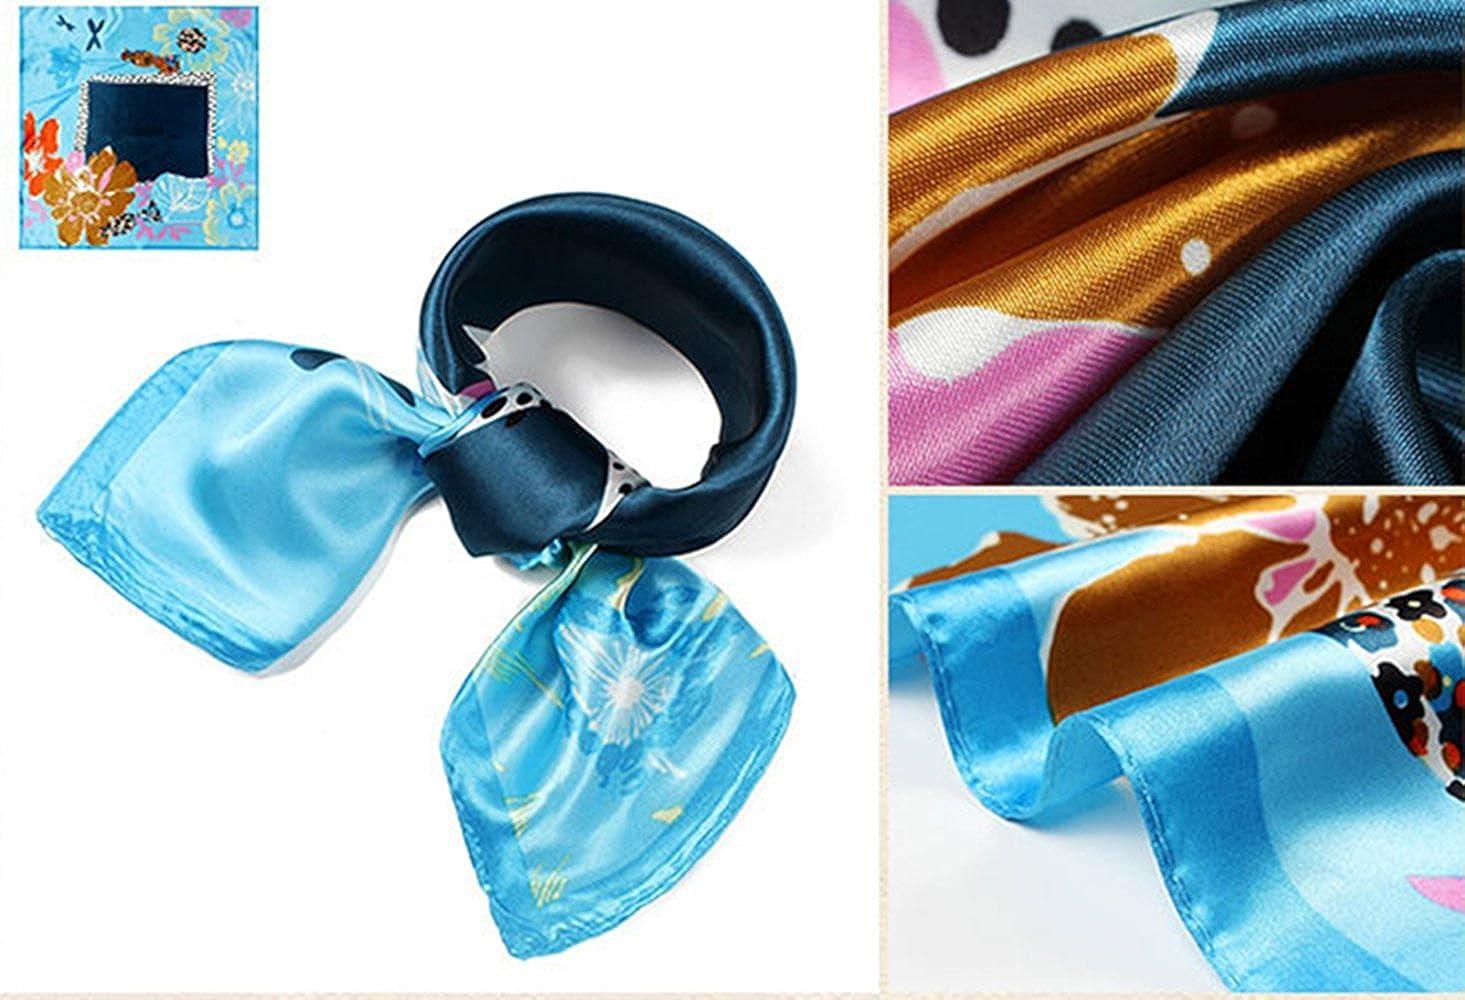 QBSM Womens 23.6 inch Satin Silk Feeling Formal Square Neck Scarf Head Hair Wraps